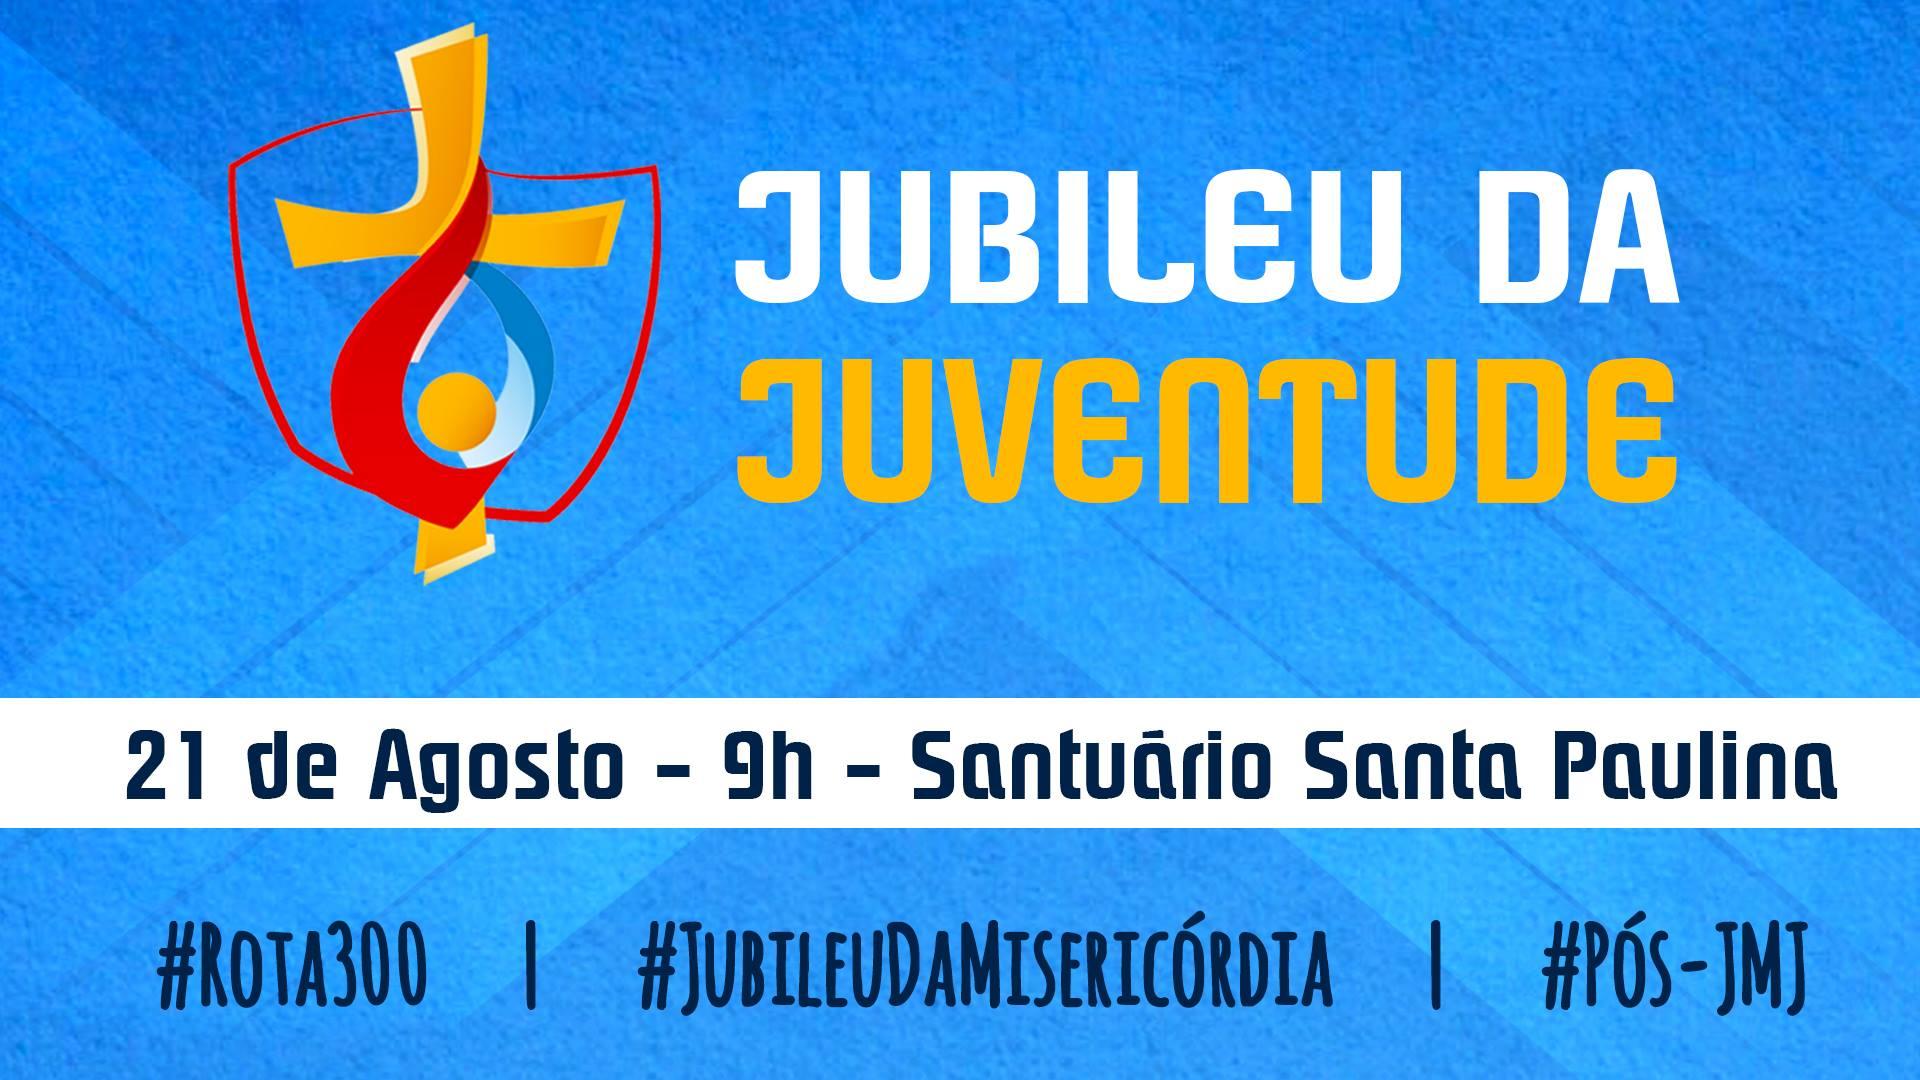 Arquidiocese de Florianópolis celebrará Jubileu da Juventude